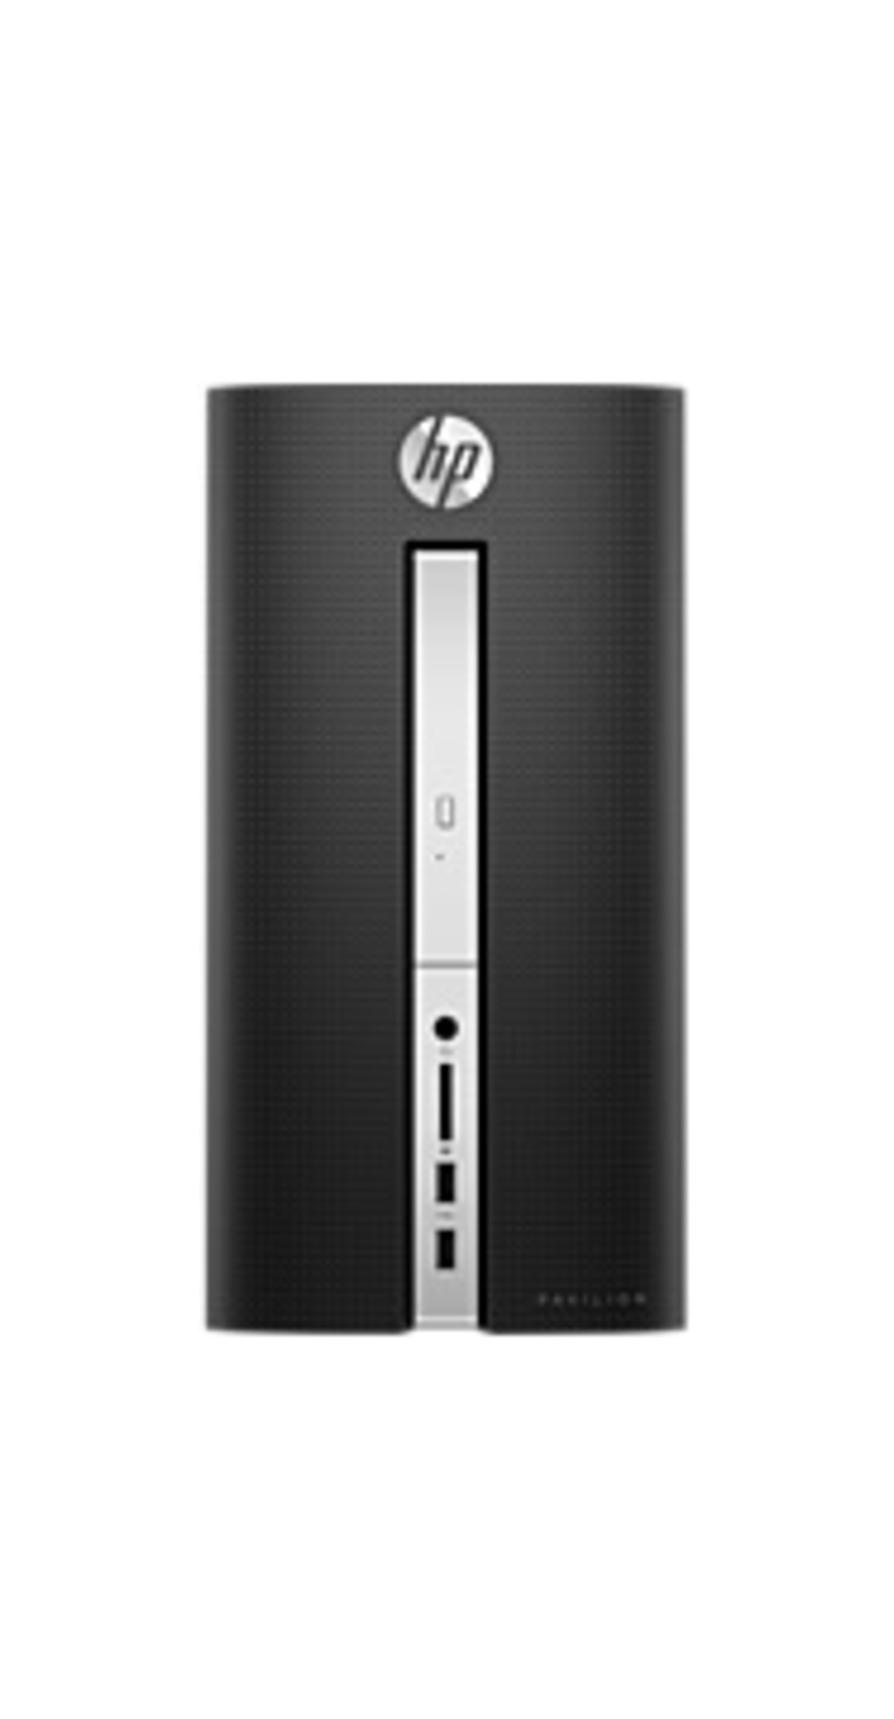 HP Pavilion V8P10AAABA 510-p020 Desktop PC - Intel Core i5-6400T 2.2 GHz Quad-Core Processor - 8 GB DDR4-2133 SDRAM - 1 TB Hard Drive - Windows 10 Hom